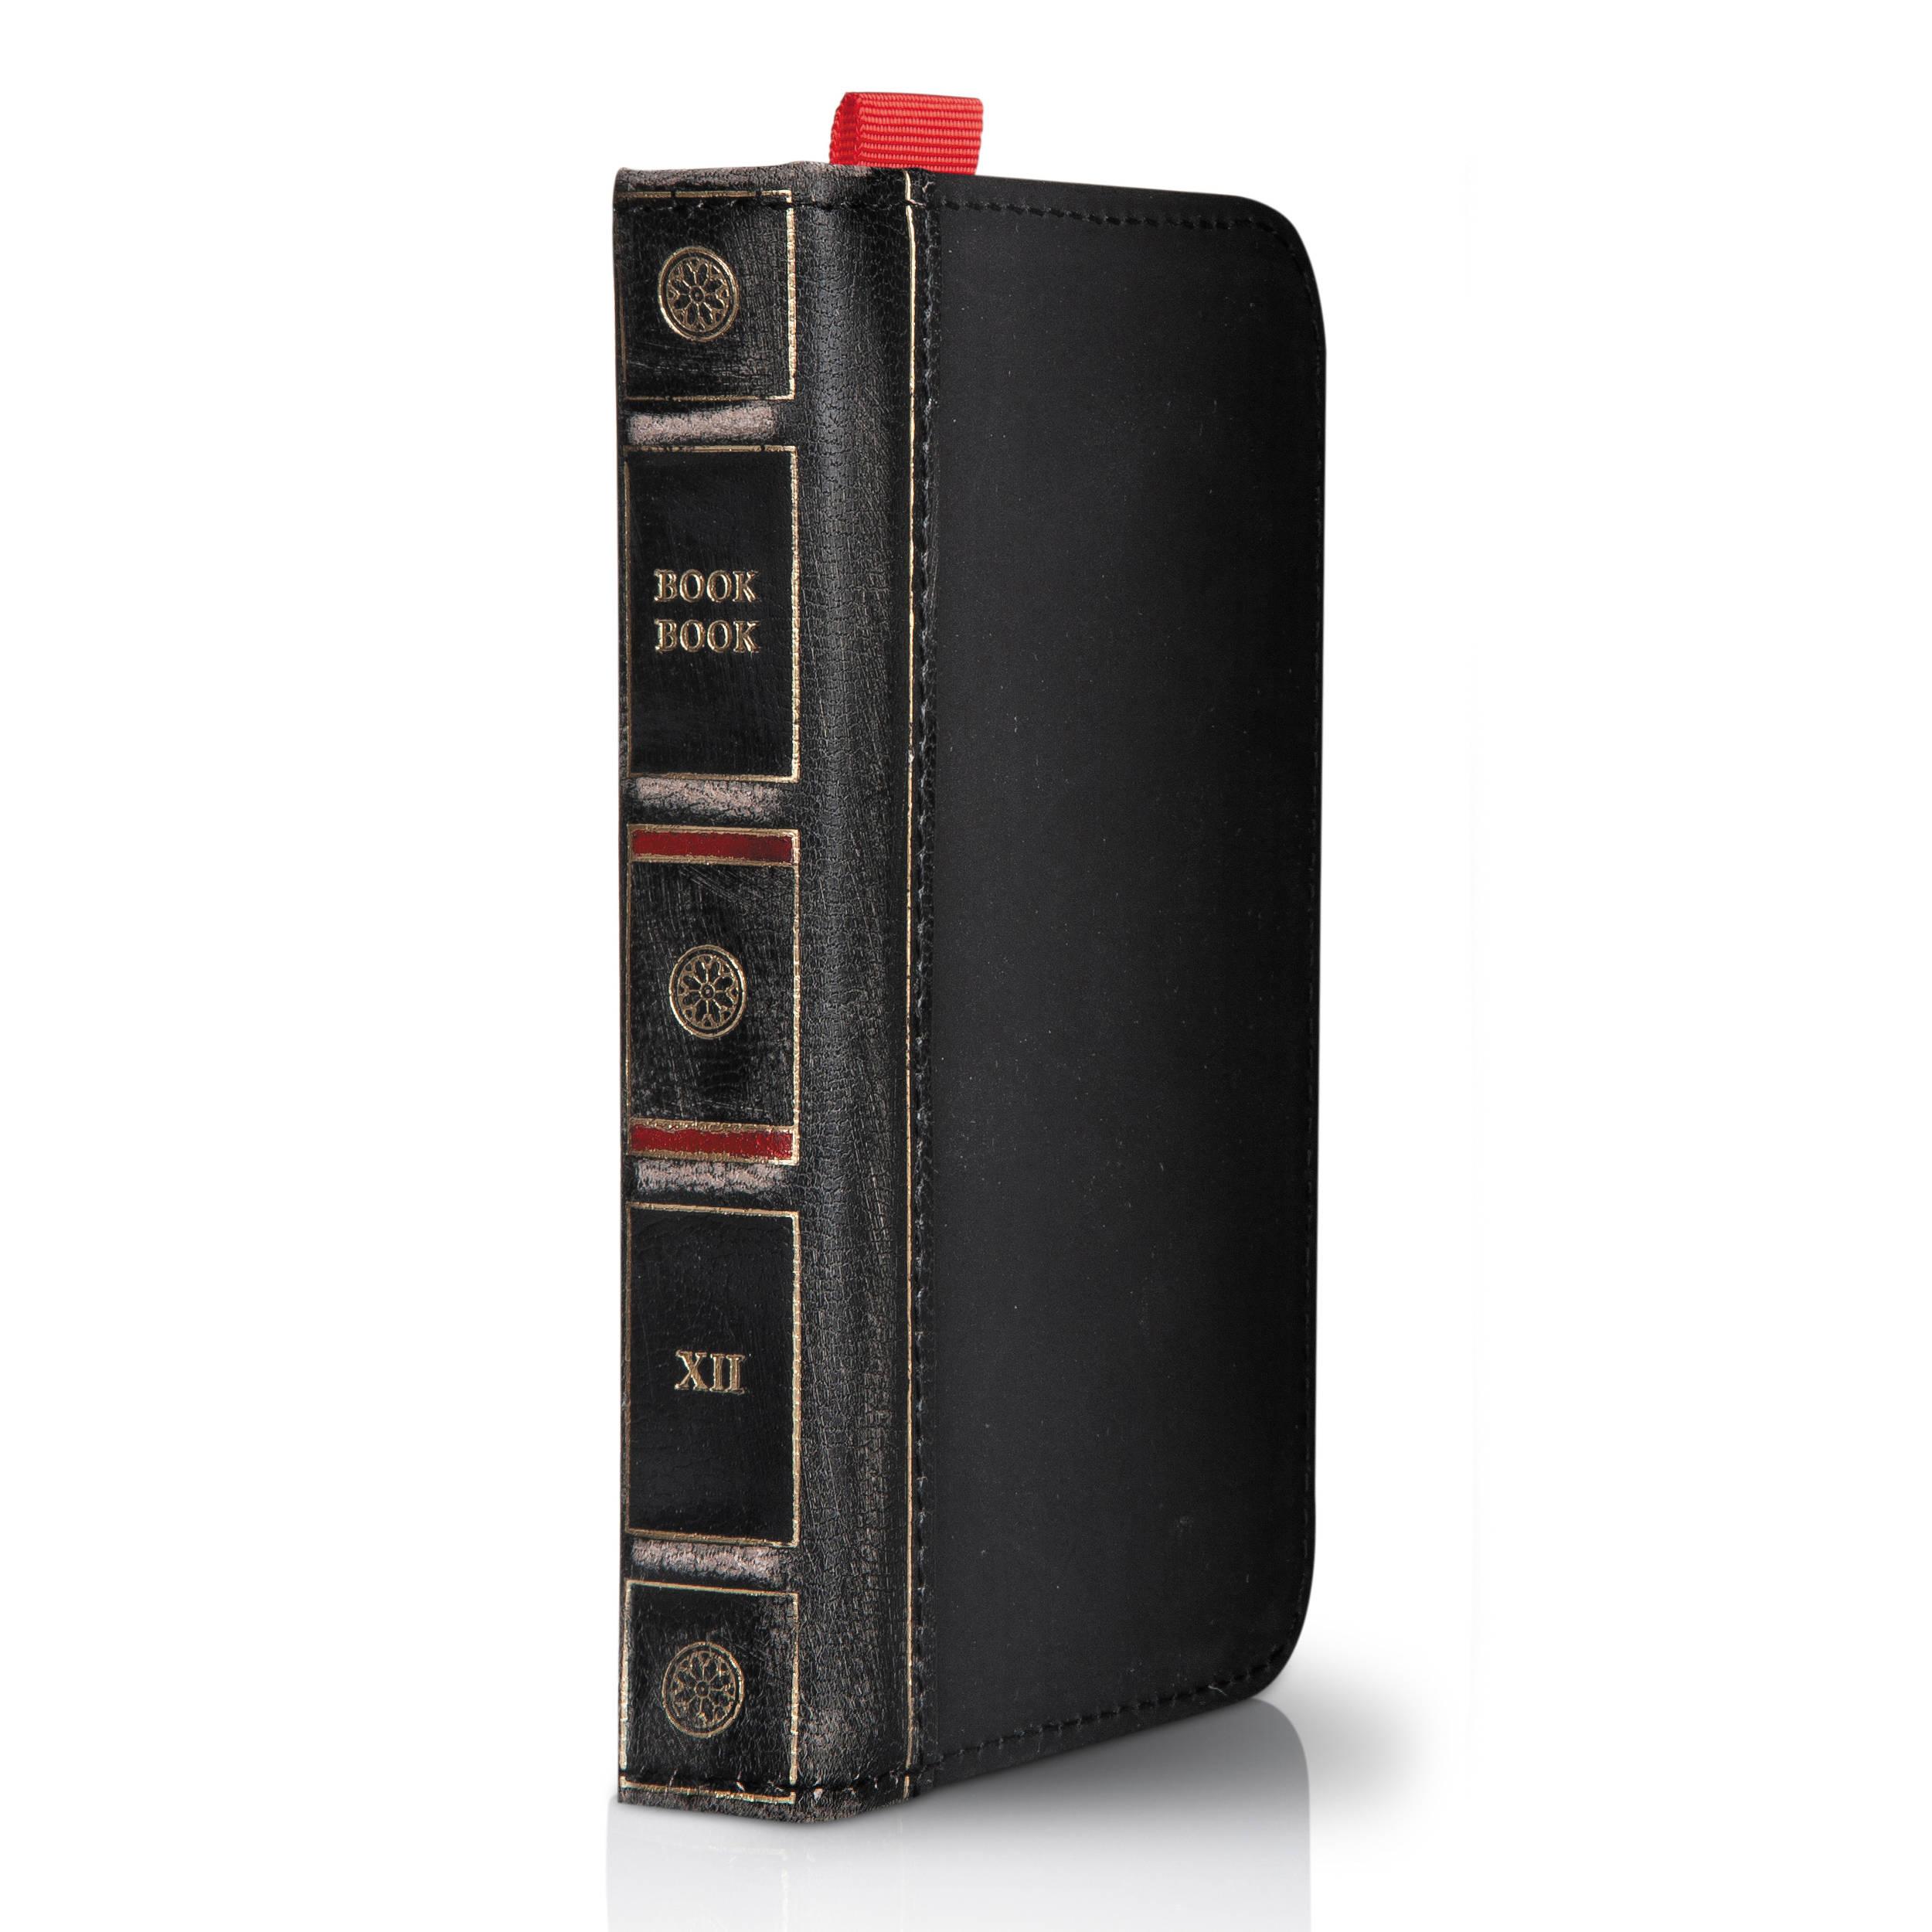 3780ef5b73 Twelve South BookBook Case for iPhone 4/4s 12-1206 B&H Photo